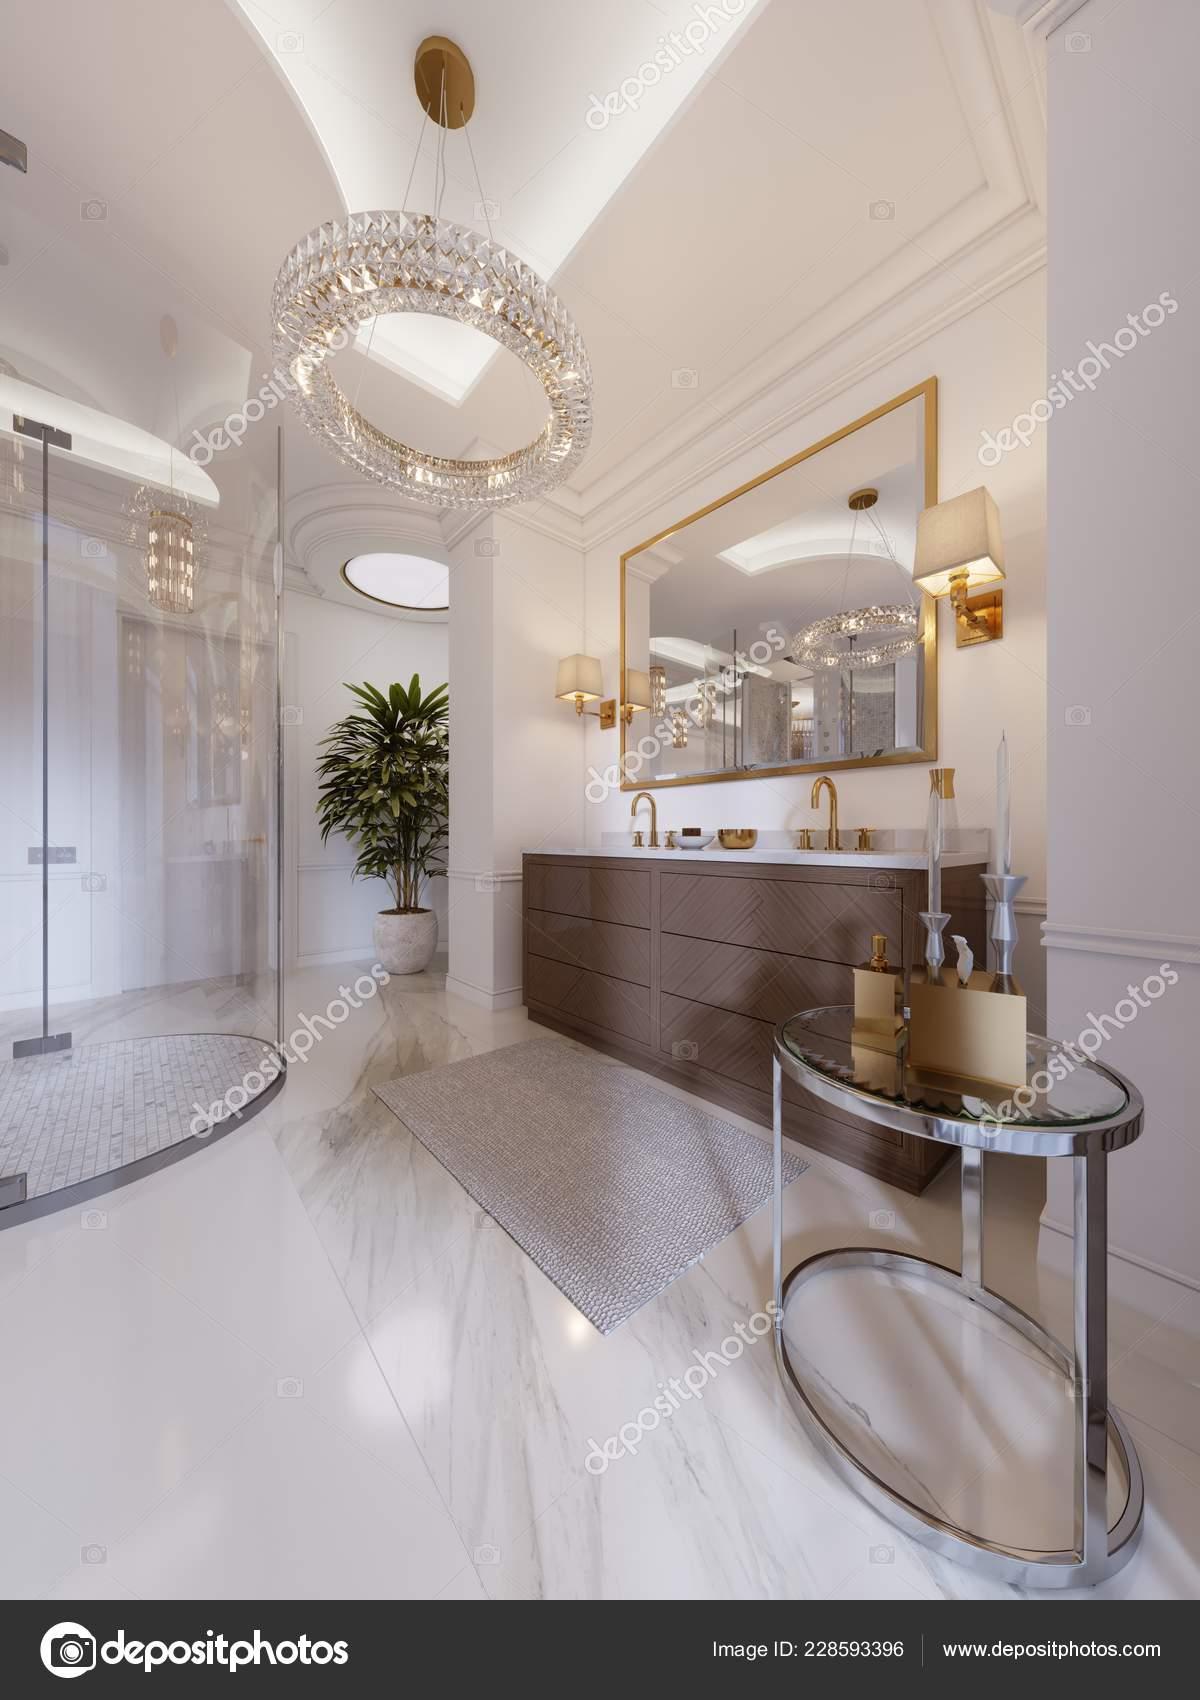 Moderno Cuarto Baño Con Tocador Espejo Marco Oro Con Apliques ...